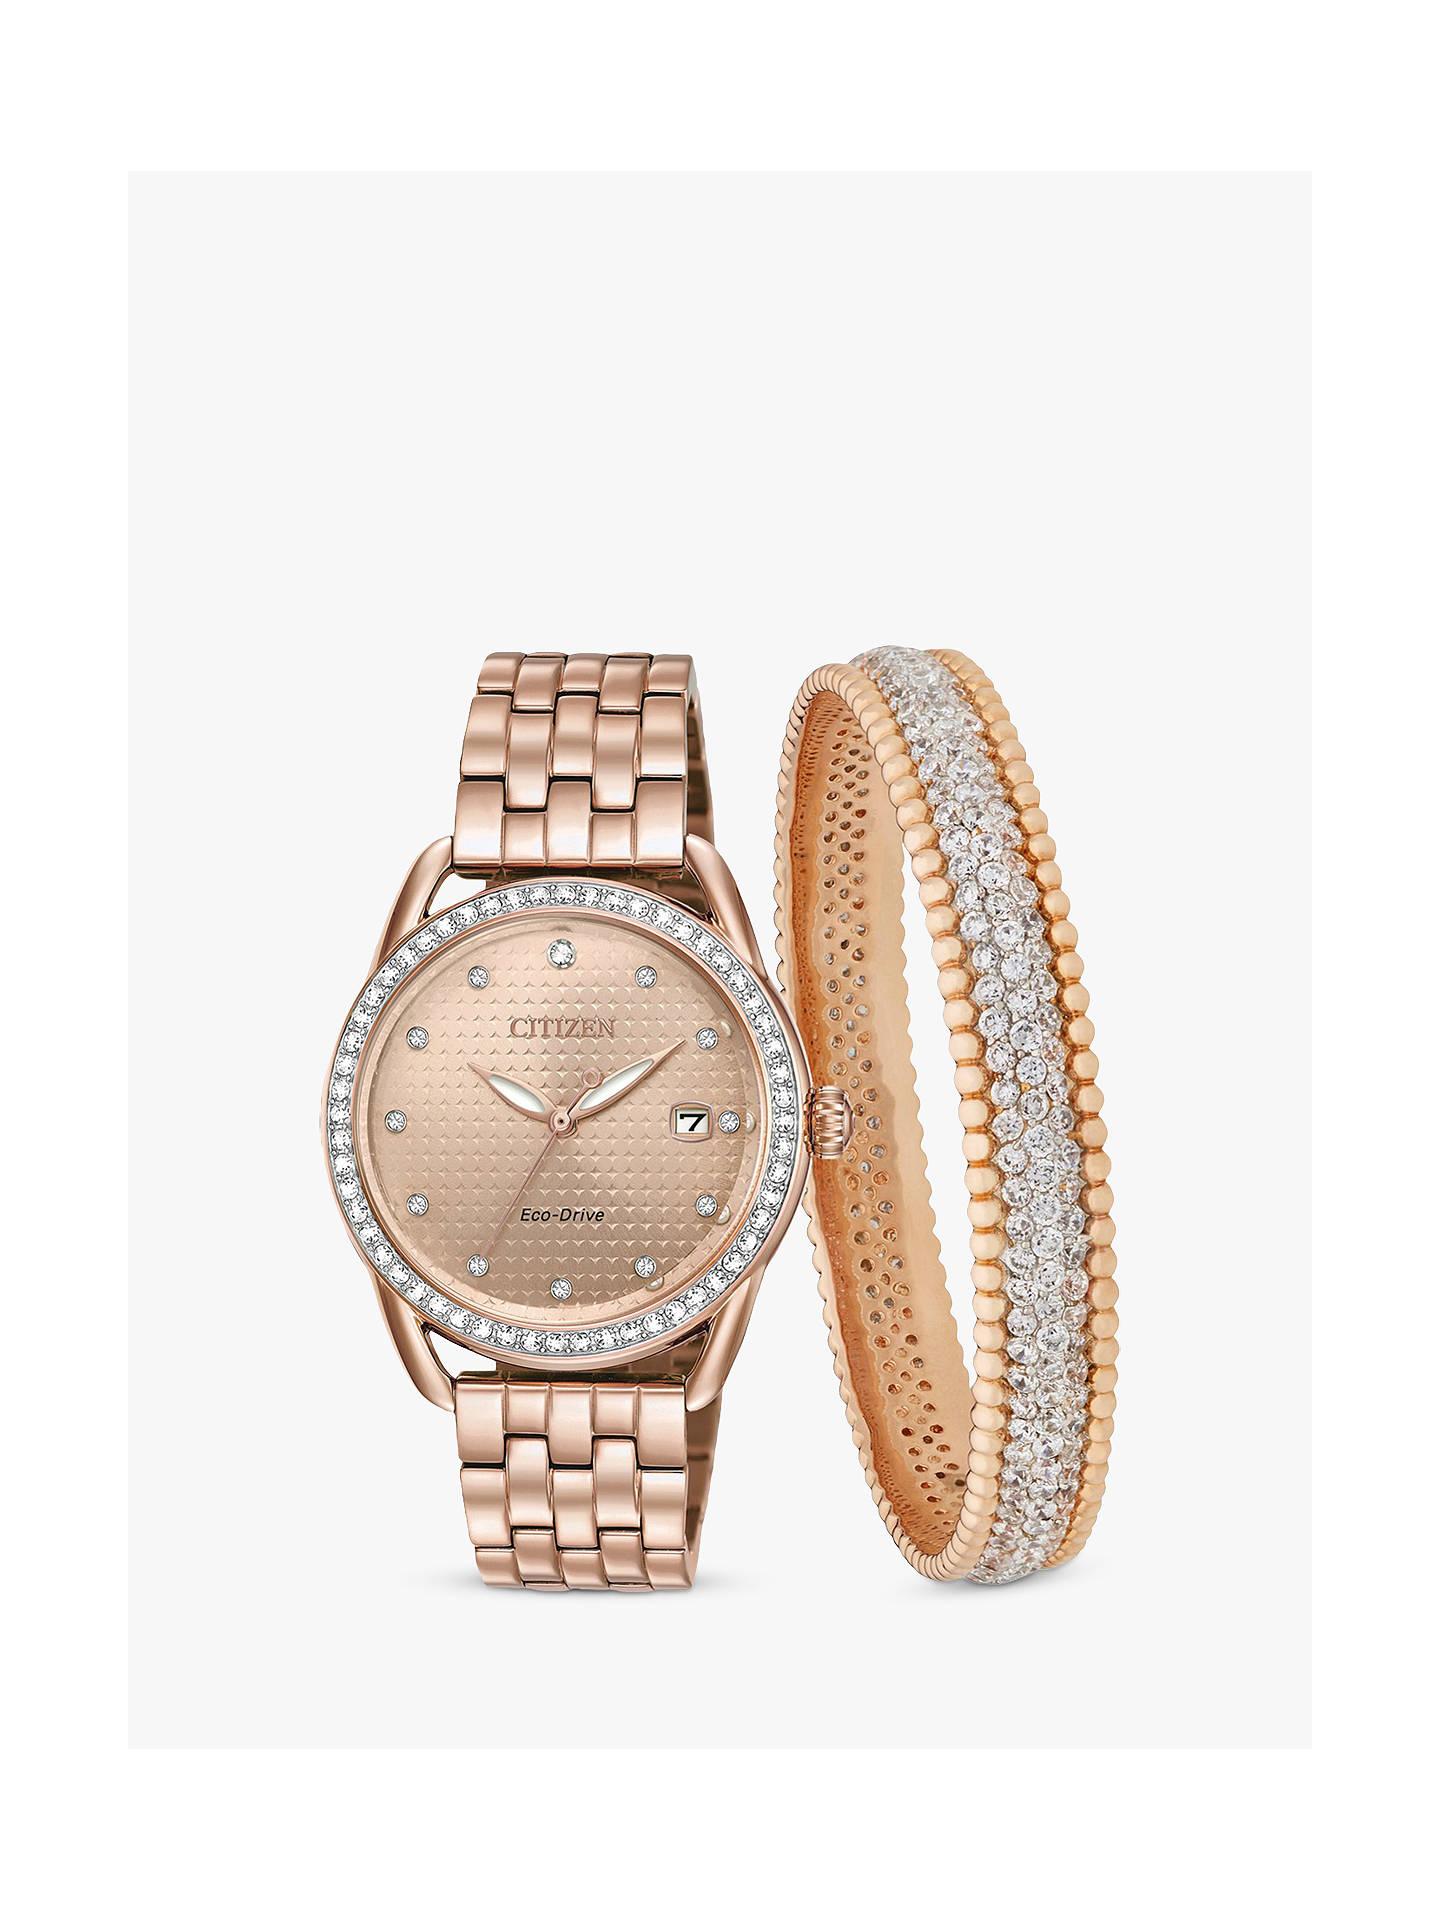 be69ab932f140 Buy Citizen FE6113-57X SET Women s Eco-Drive Swarovski Crystal Date  Bracelet Strap Watch ...